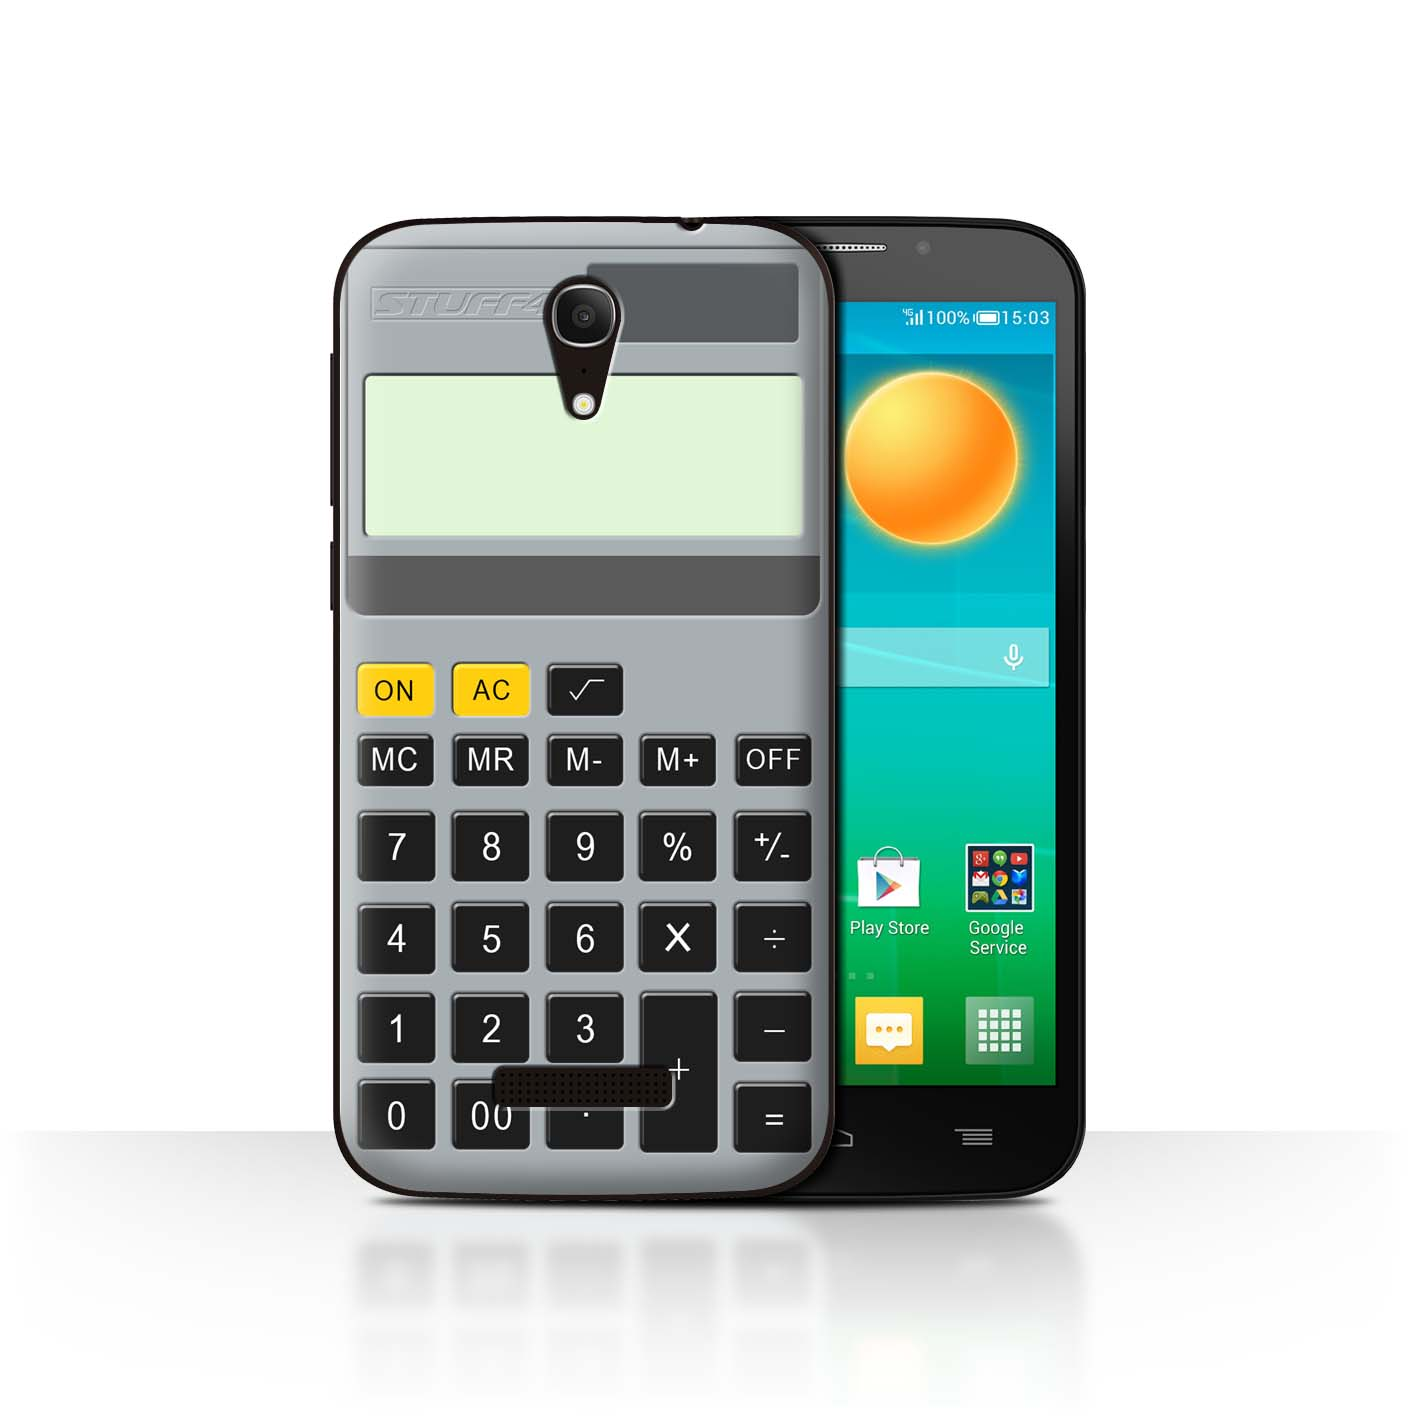 STUFF4-Back-Case-Cover-Skin-for-Alcatel-Pop-S7-Keys-Buttons